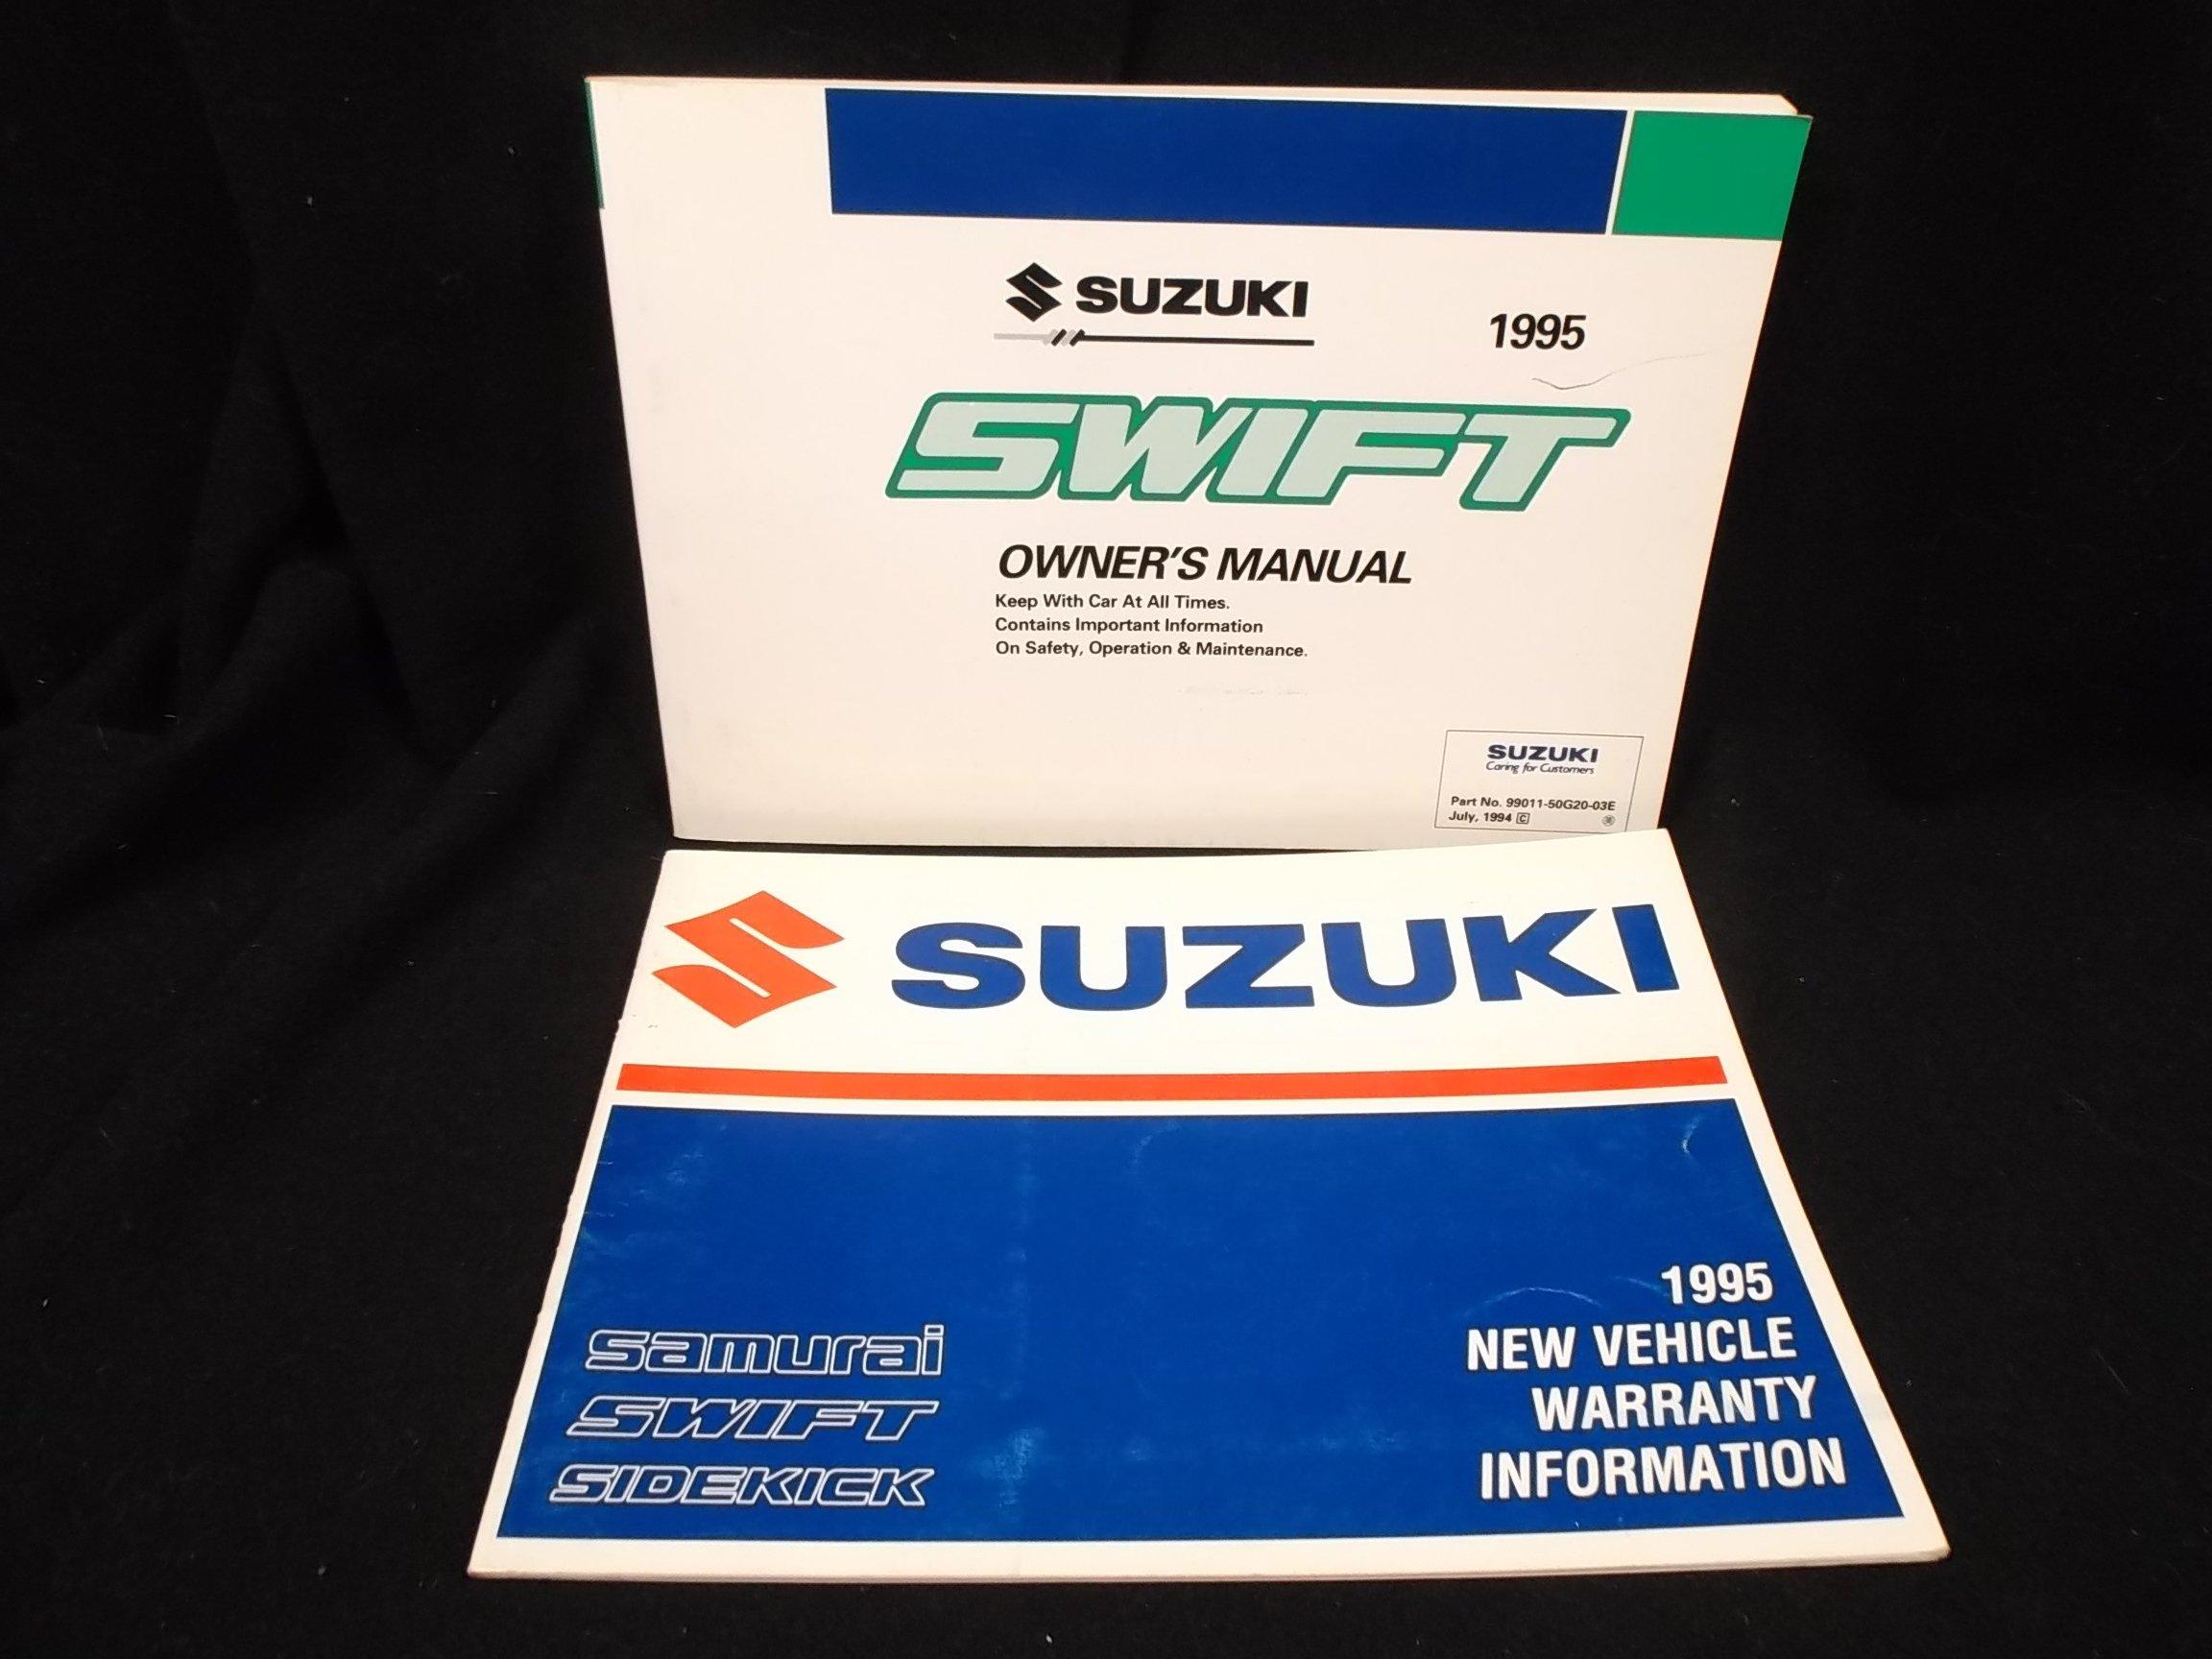 1995 suzuki swift owners manual suzuki amazon com books rh amazon com 1990 Suzuki Swift 2005 Suzuki Swift